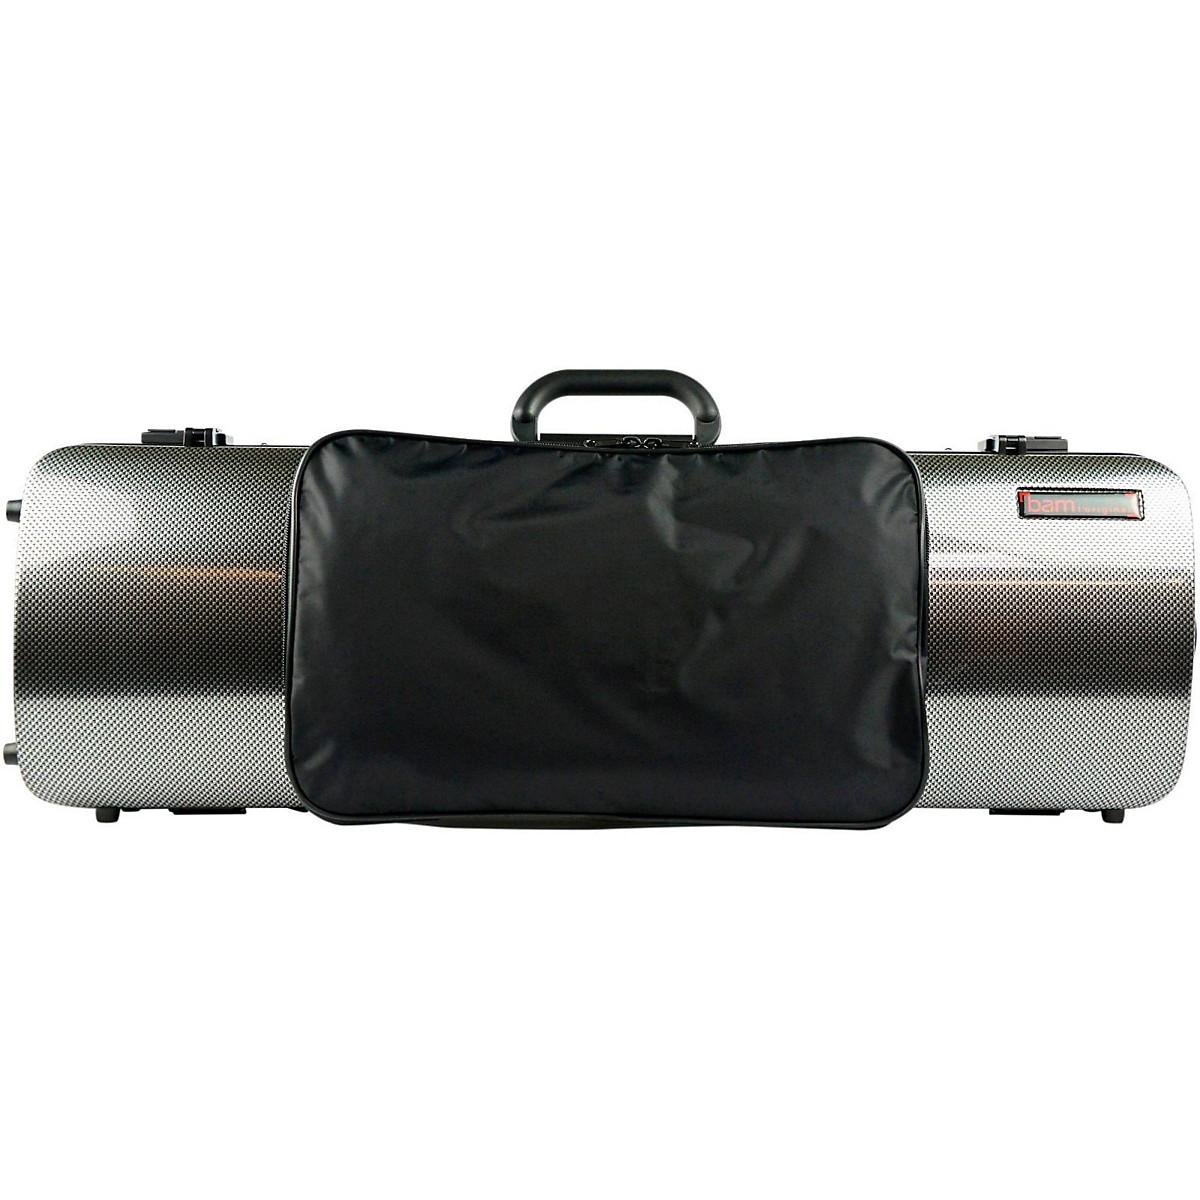 Bam 2011XL Hightech Oblong Violin Case with Pocket